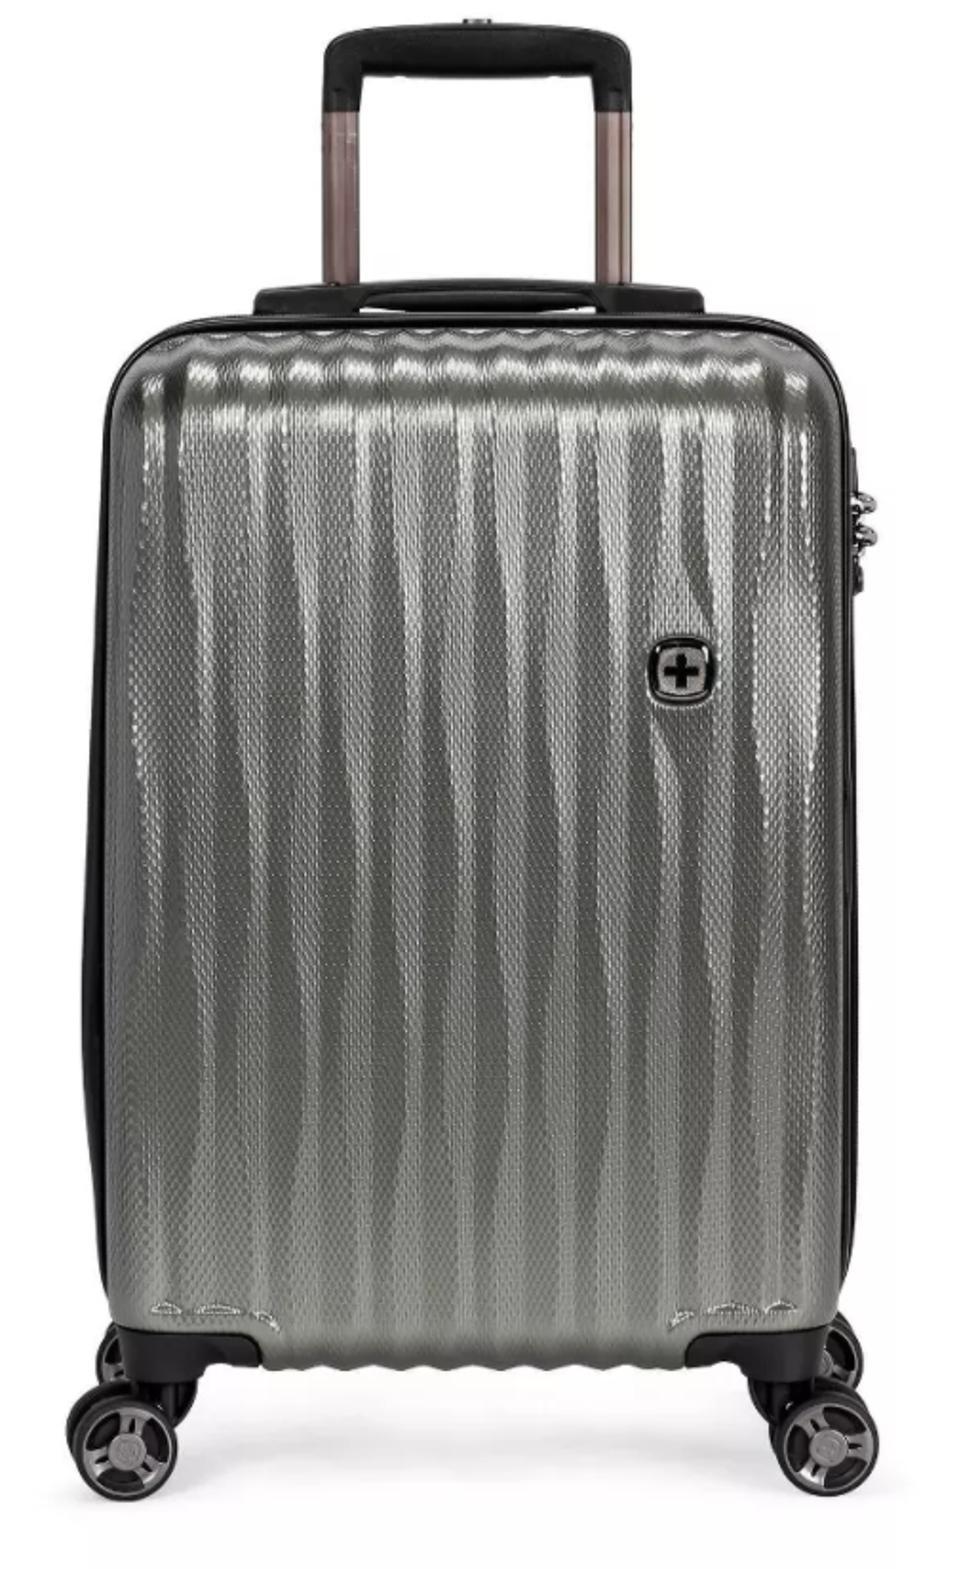 SWISSGEAR 20″ Energie USB Port PolyCarbonate Hardside Carry On Suitcase